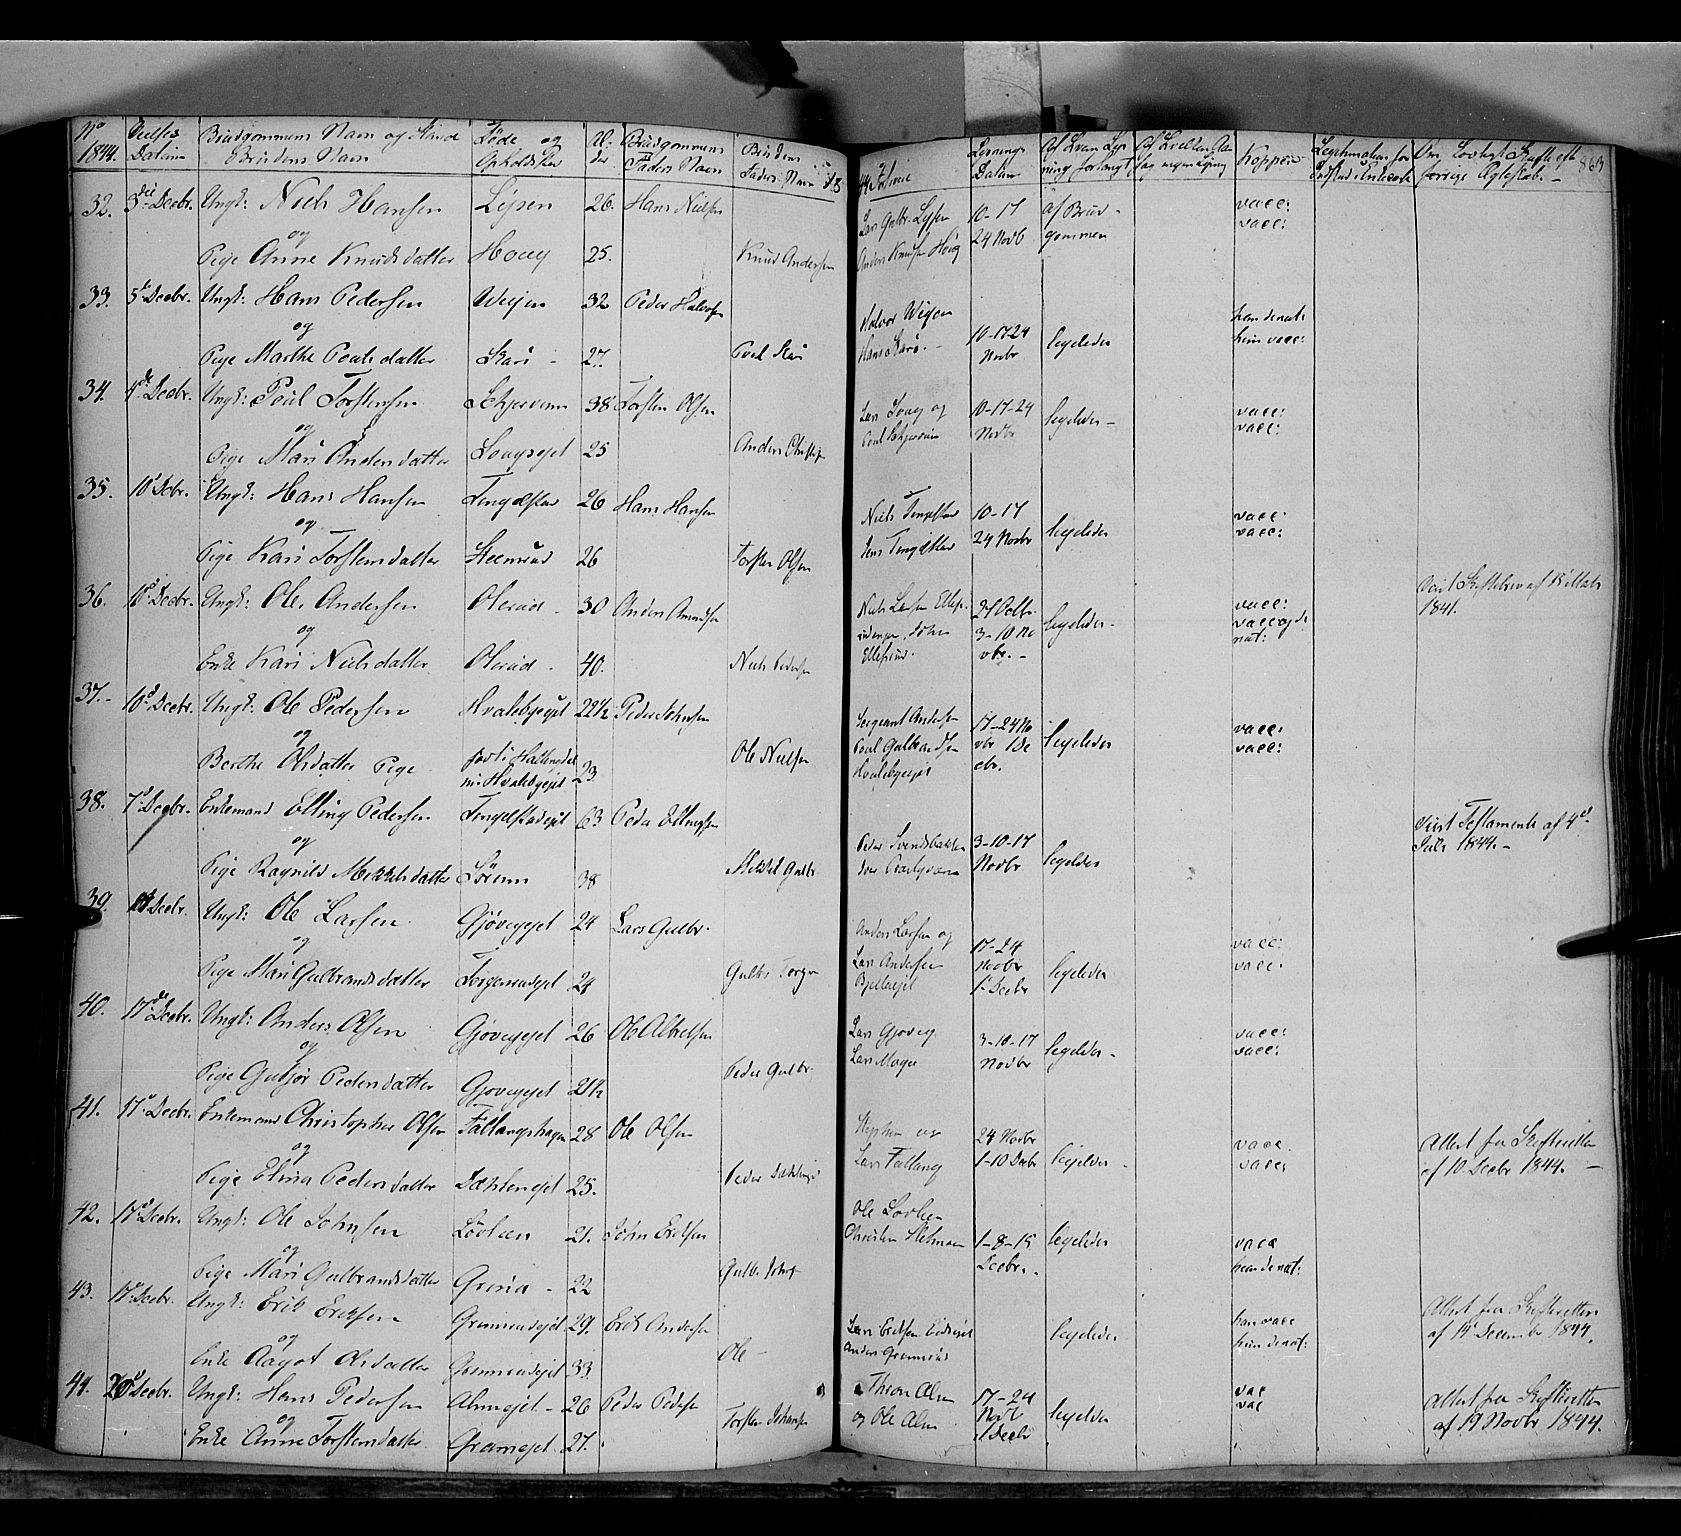 SAH, Gran prestekontor, Ministerialbok nr. 11, 1842-1856, s. 862-863